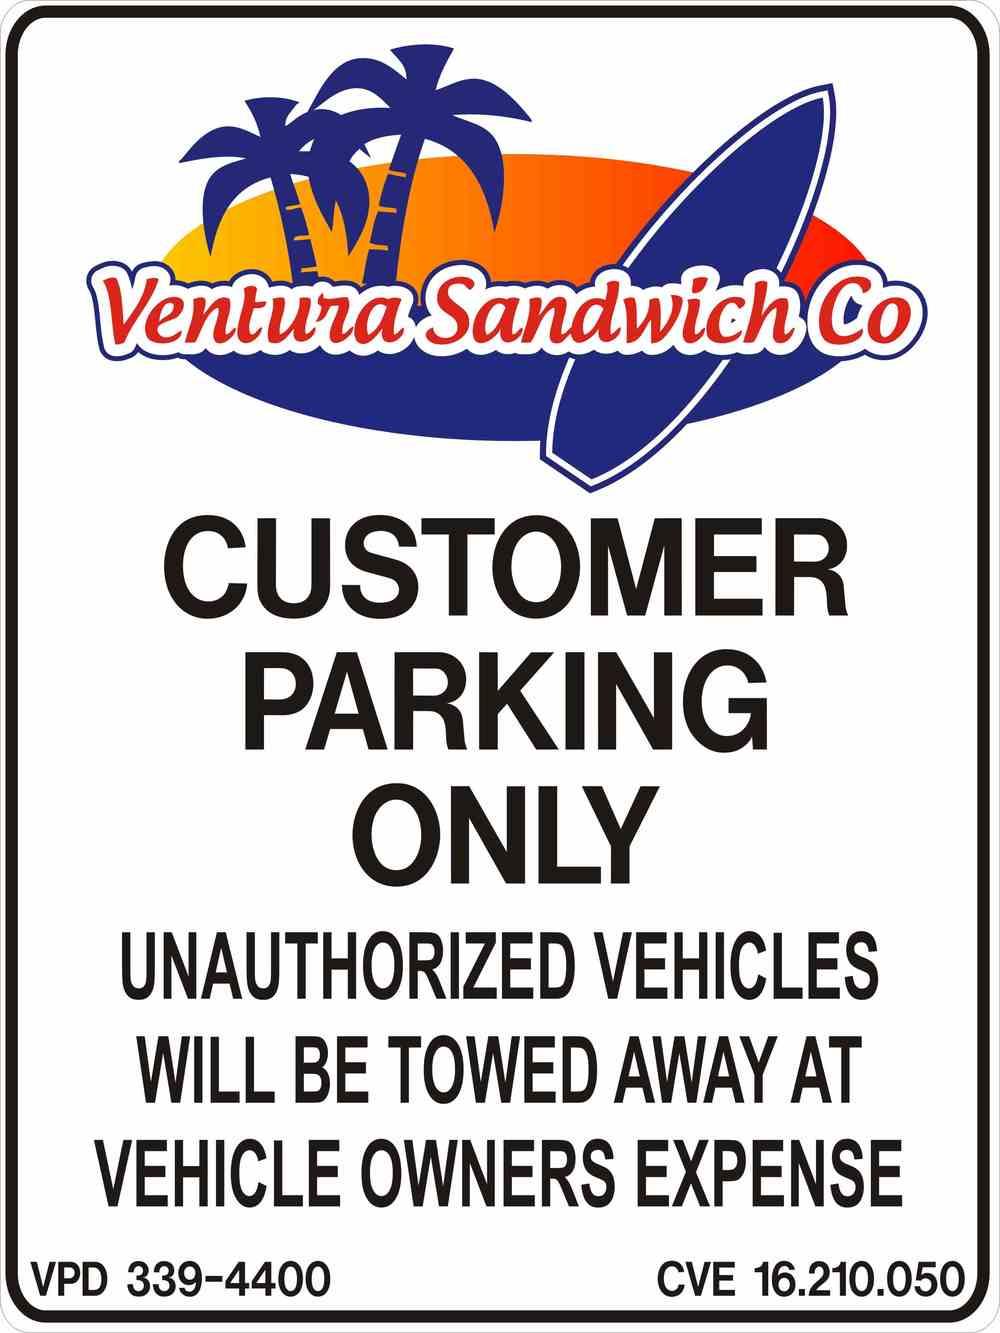 ventura sandwich logo.jpg